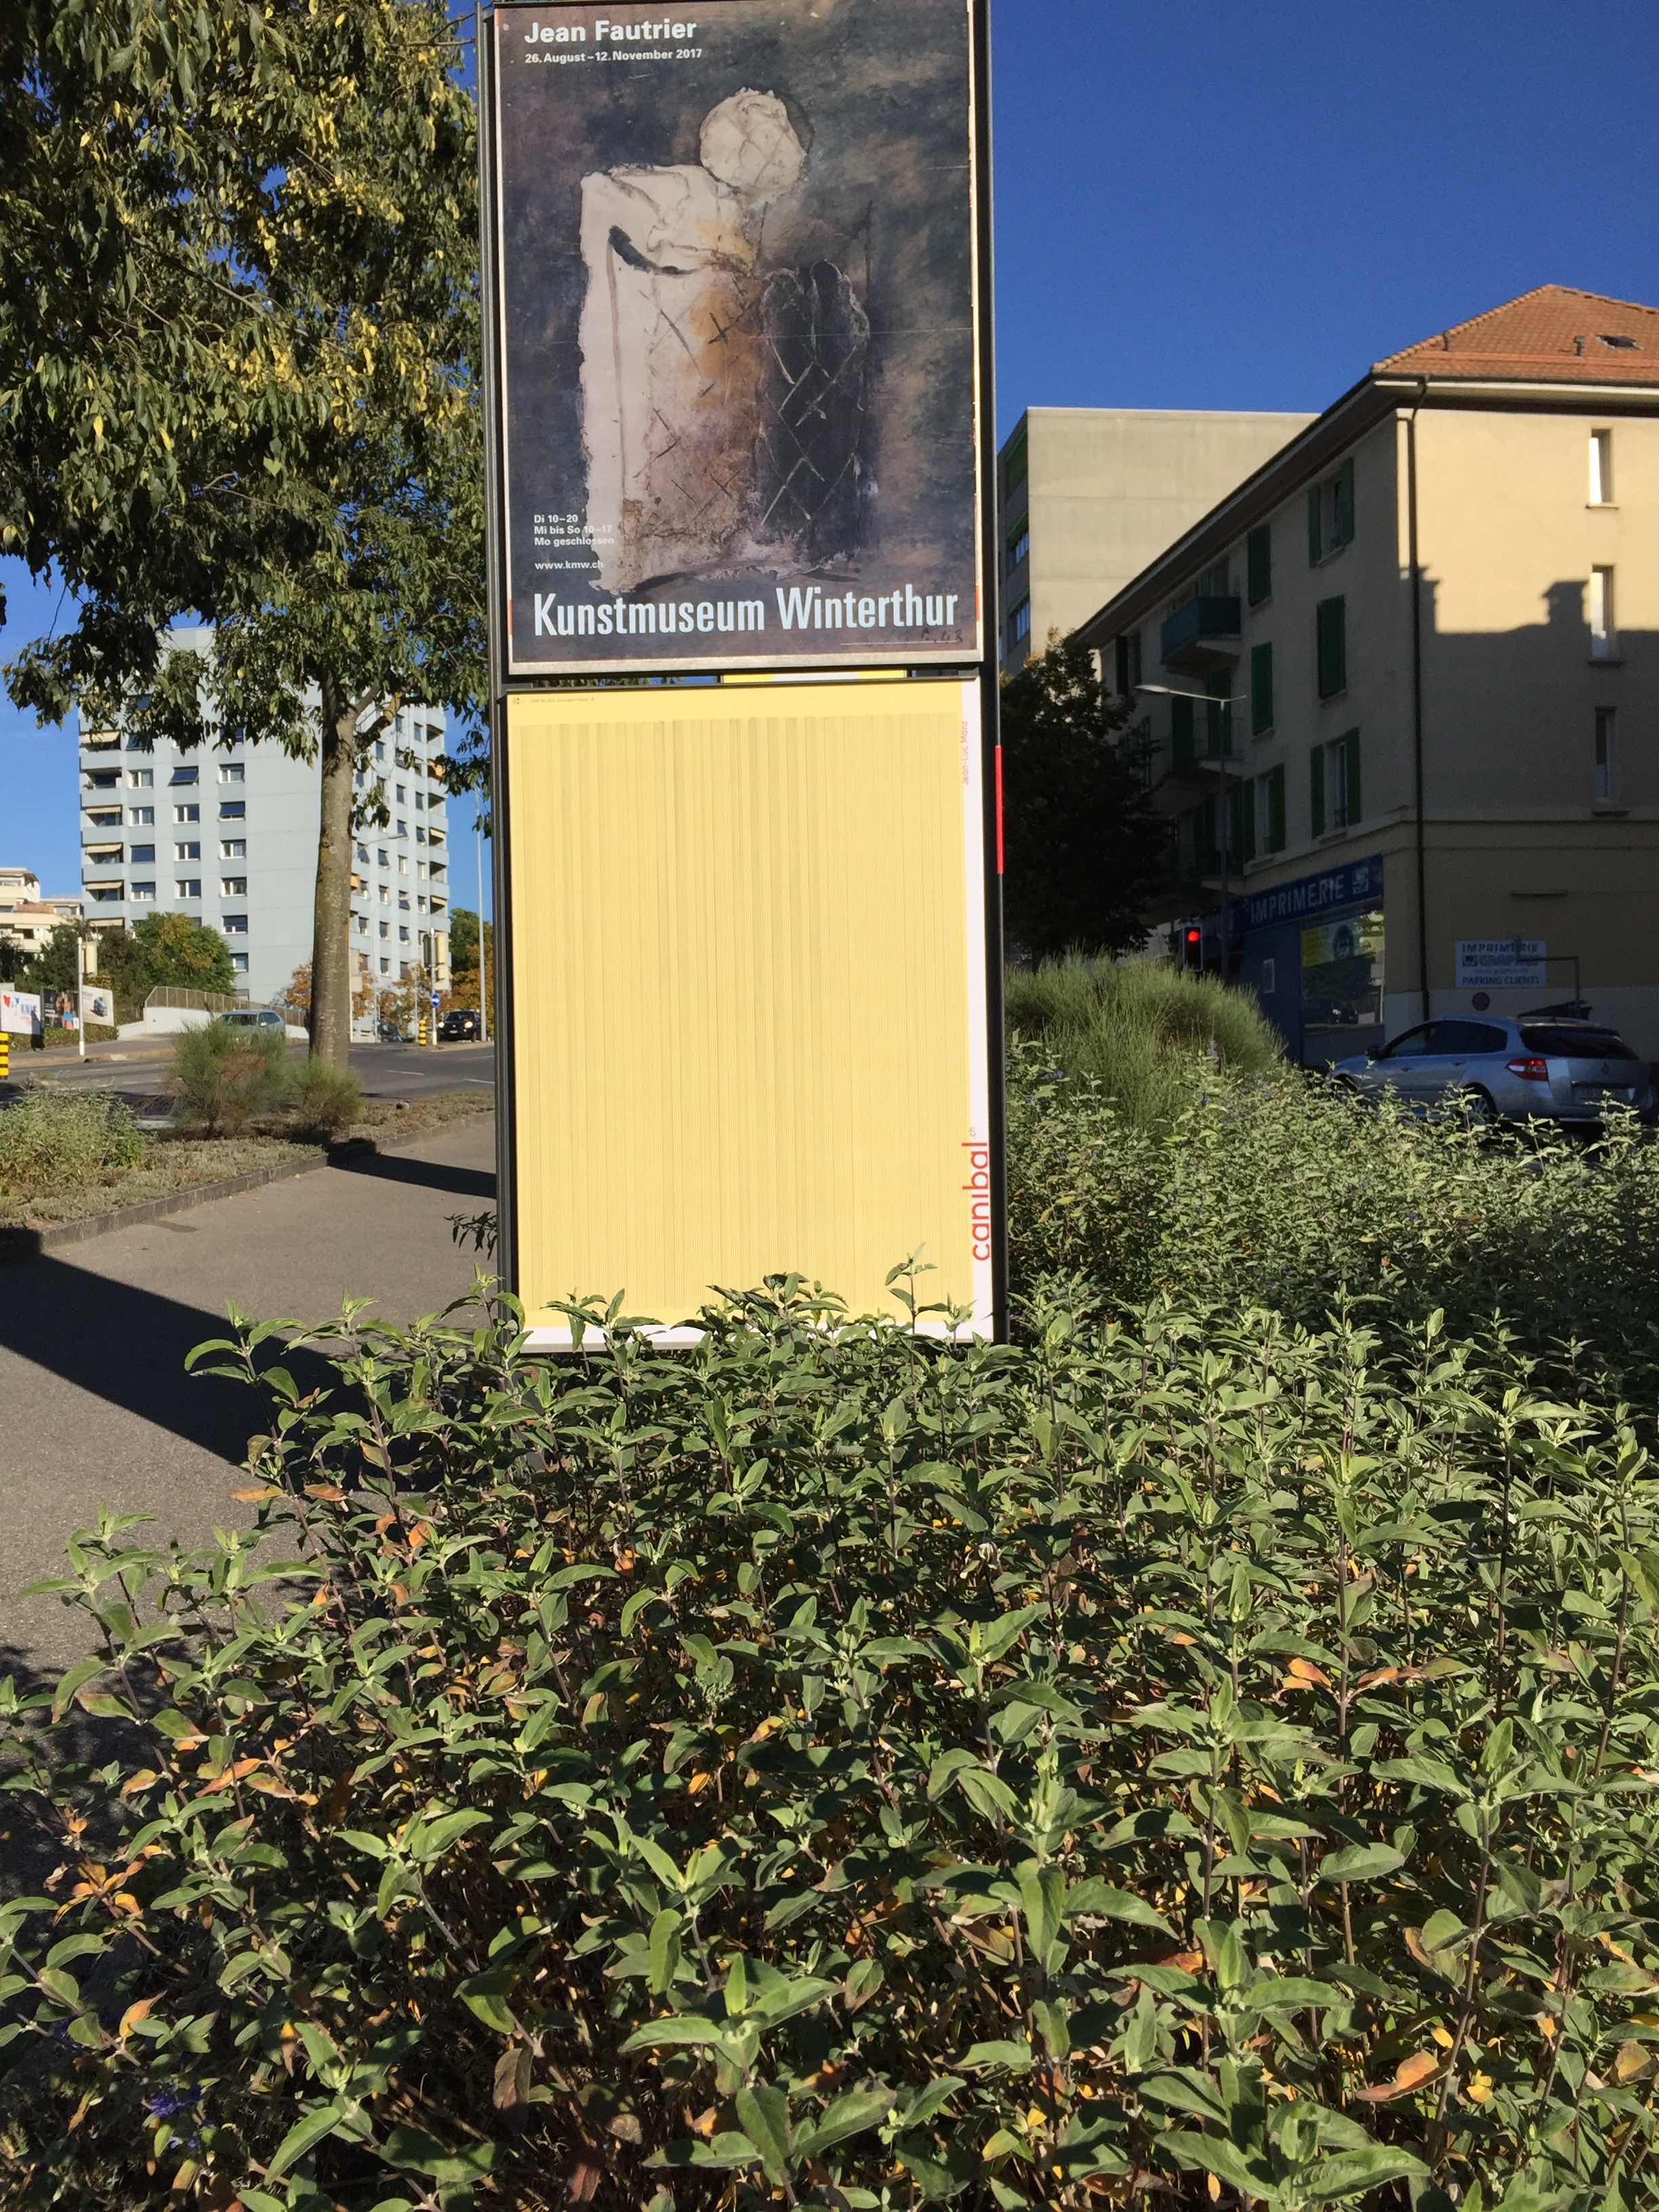 Jean-Luc Manz, avenue de tivoli 25, Lausanne-IMG_5887